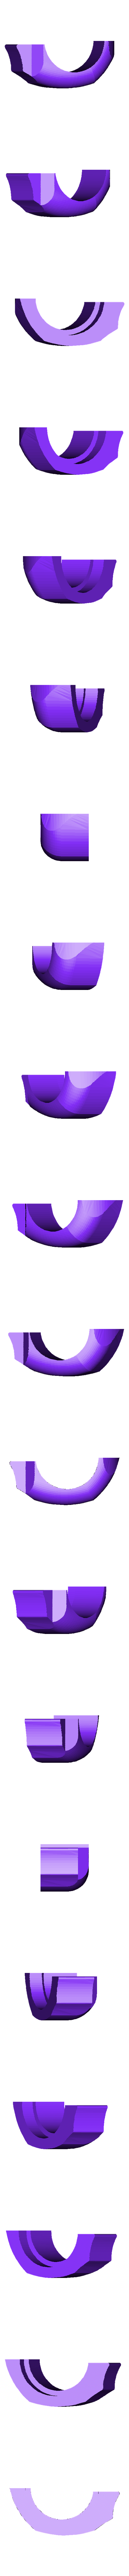 Body_Leg_Base_-_Right.stl Download free STL file Imperial Crusader Mech - New Legs • 3D printable model, GarinC3D